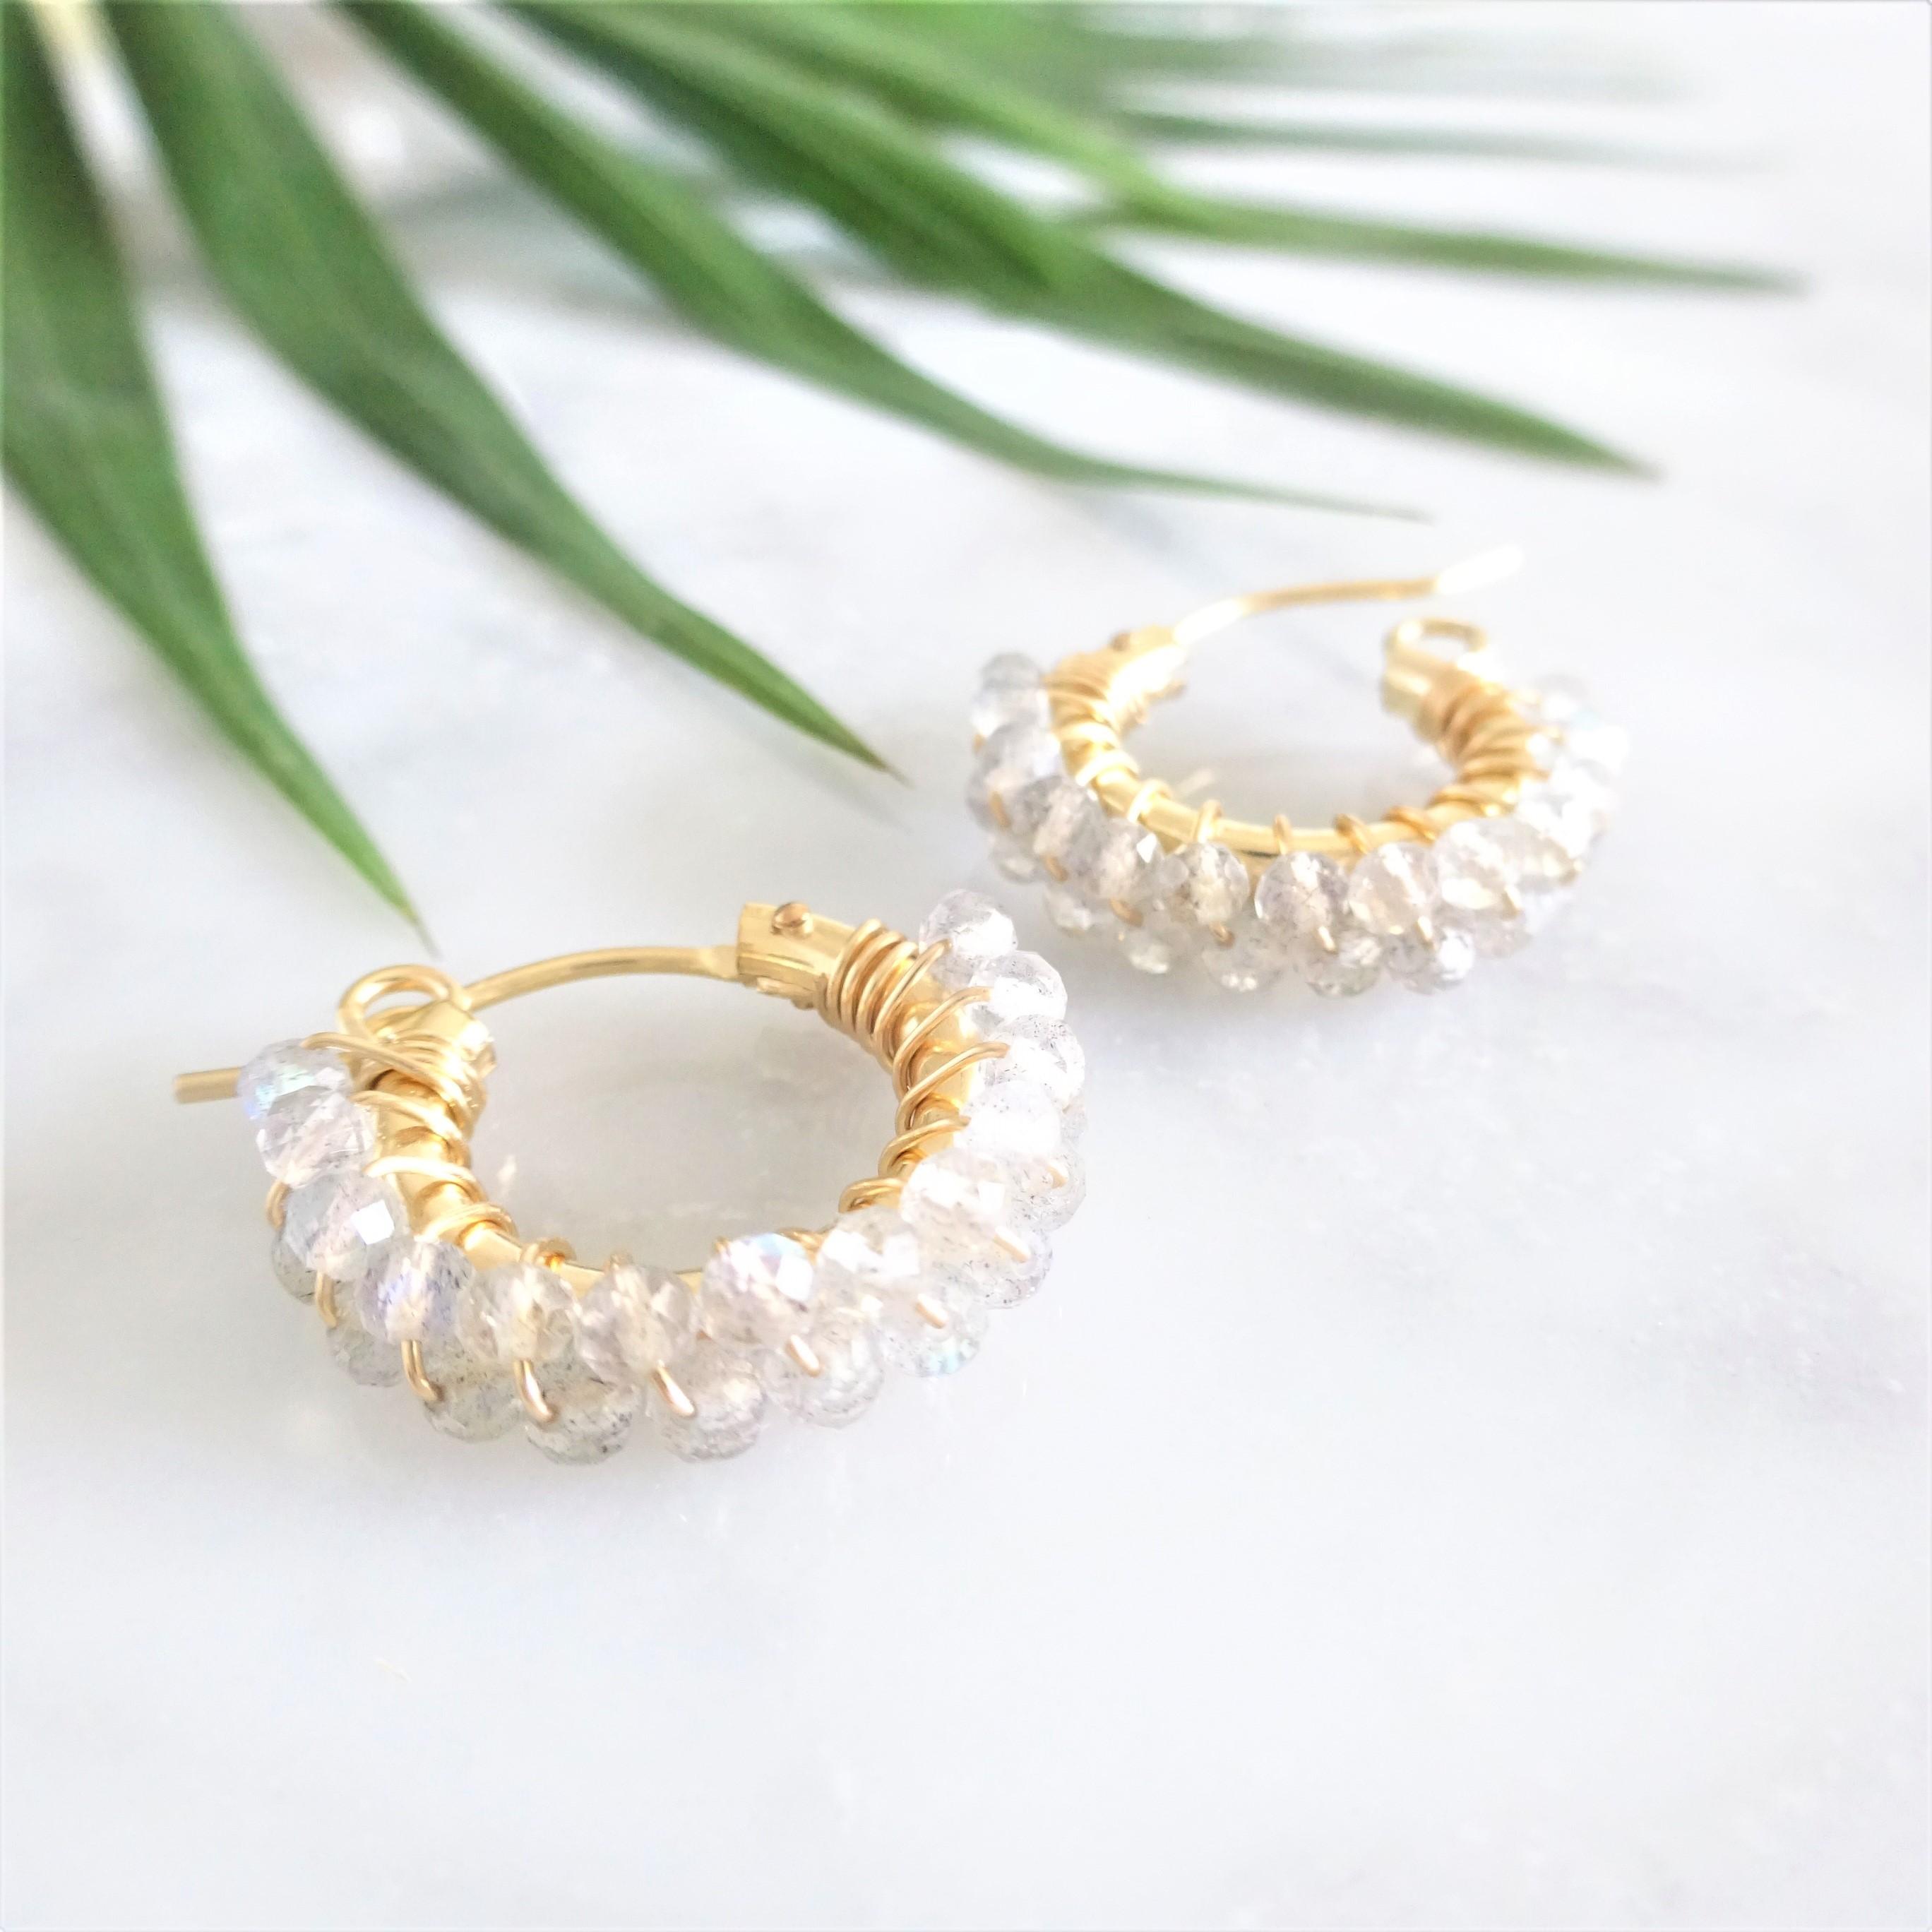 送料無料 14kgf*AAA宝石質 Labradorite wrapped pierced earring/earring